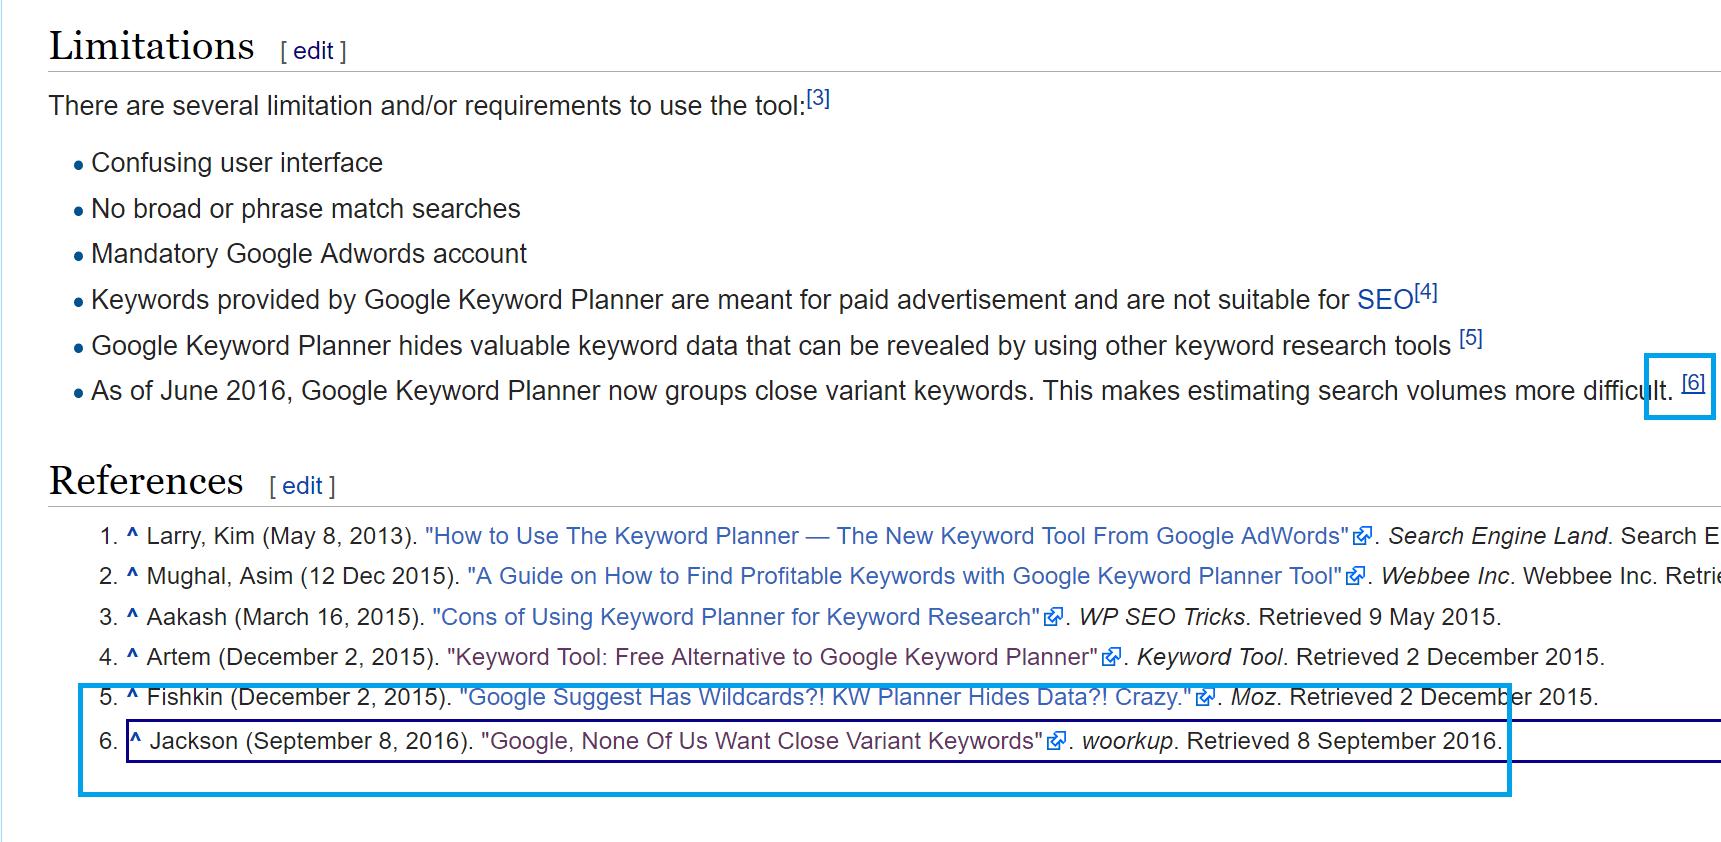 wikipedia references citation